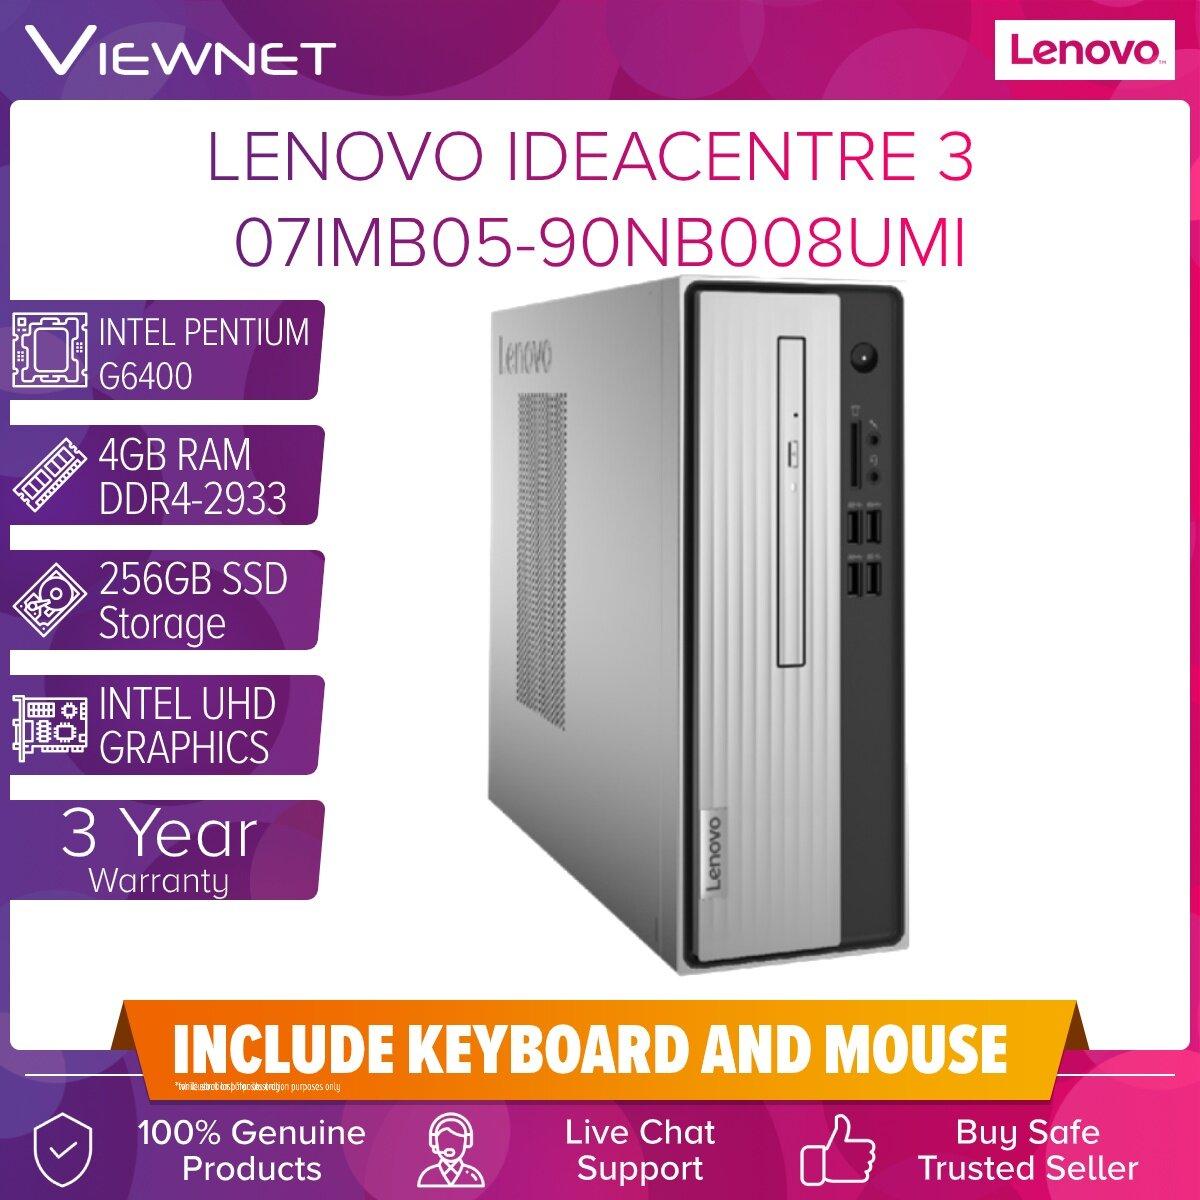 LENOVO IDEACENTER 3 07IMB05-90NB008UMI INTEL PENTIUM G6400 4GB DDR4 256GB SSD DVDRW INTEL HD 3 Years Warranty Onsite